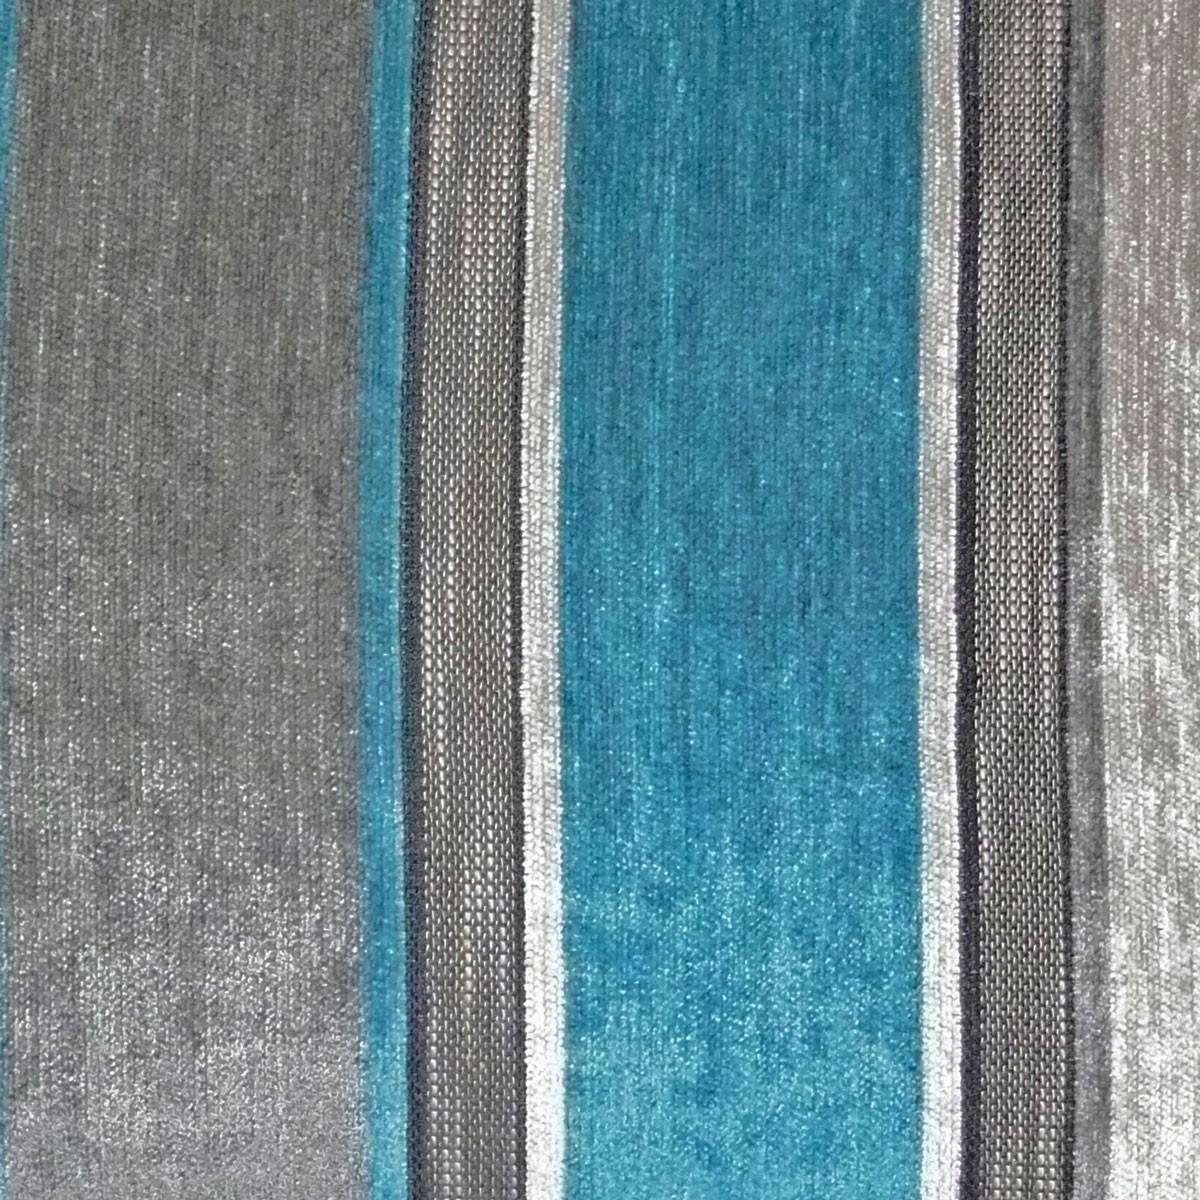 kissen kissenh lle streifen grau t rkis 50x50cm ebay. Black Bedroom Furniture Sets. Home Design Ideas